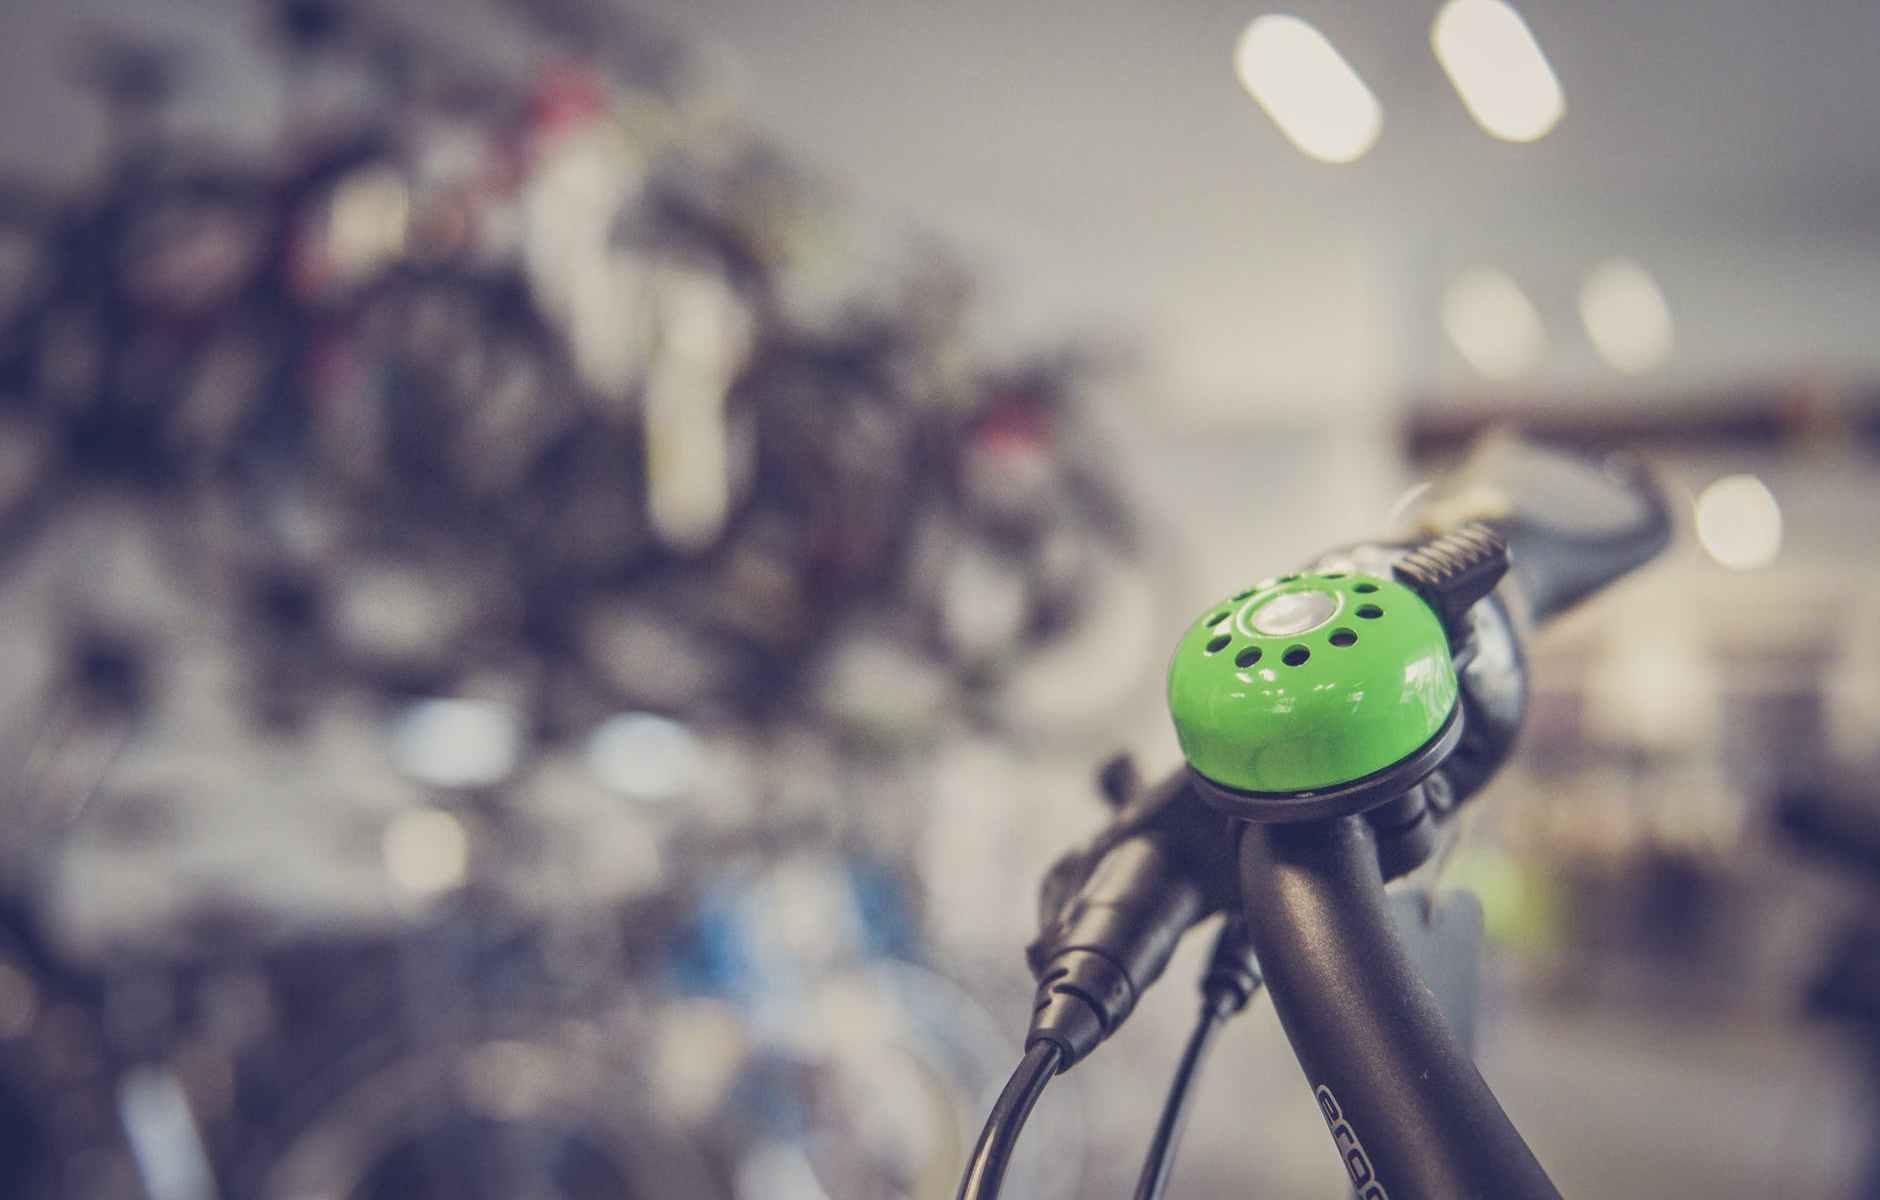 Bell on bike